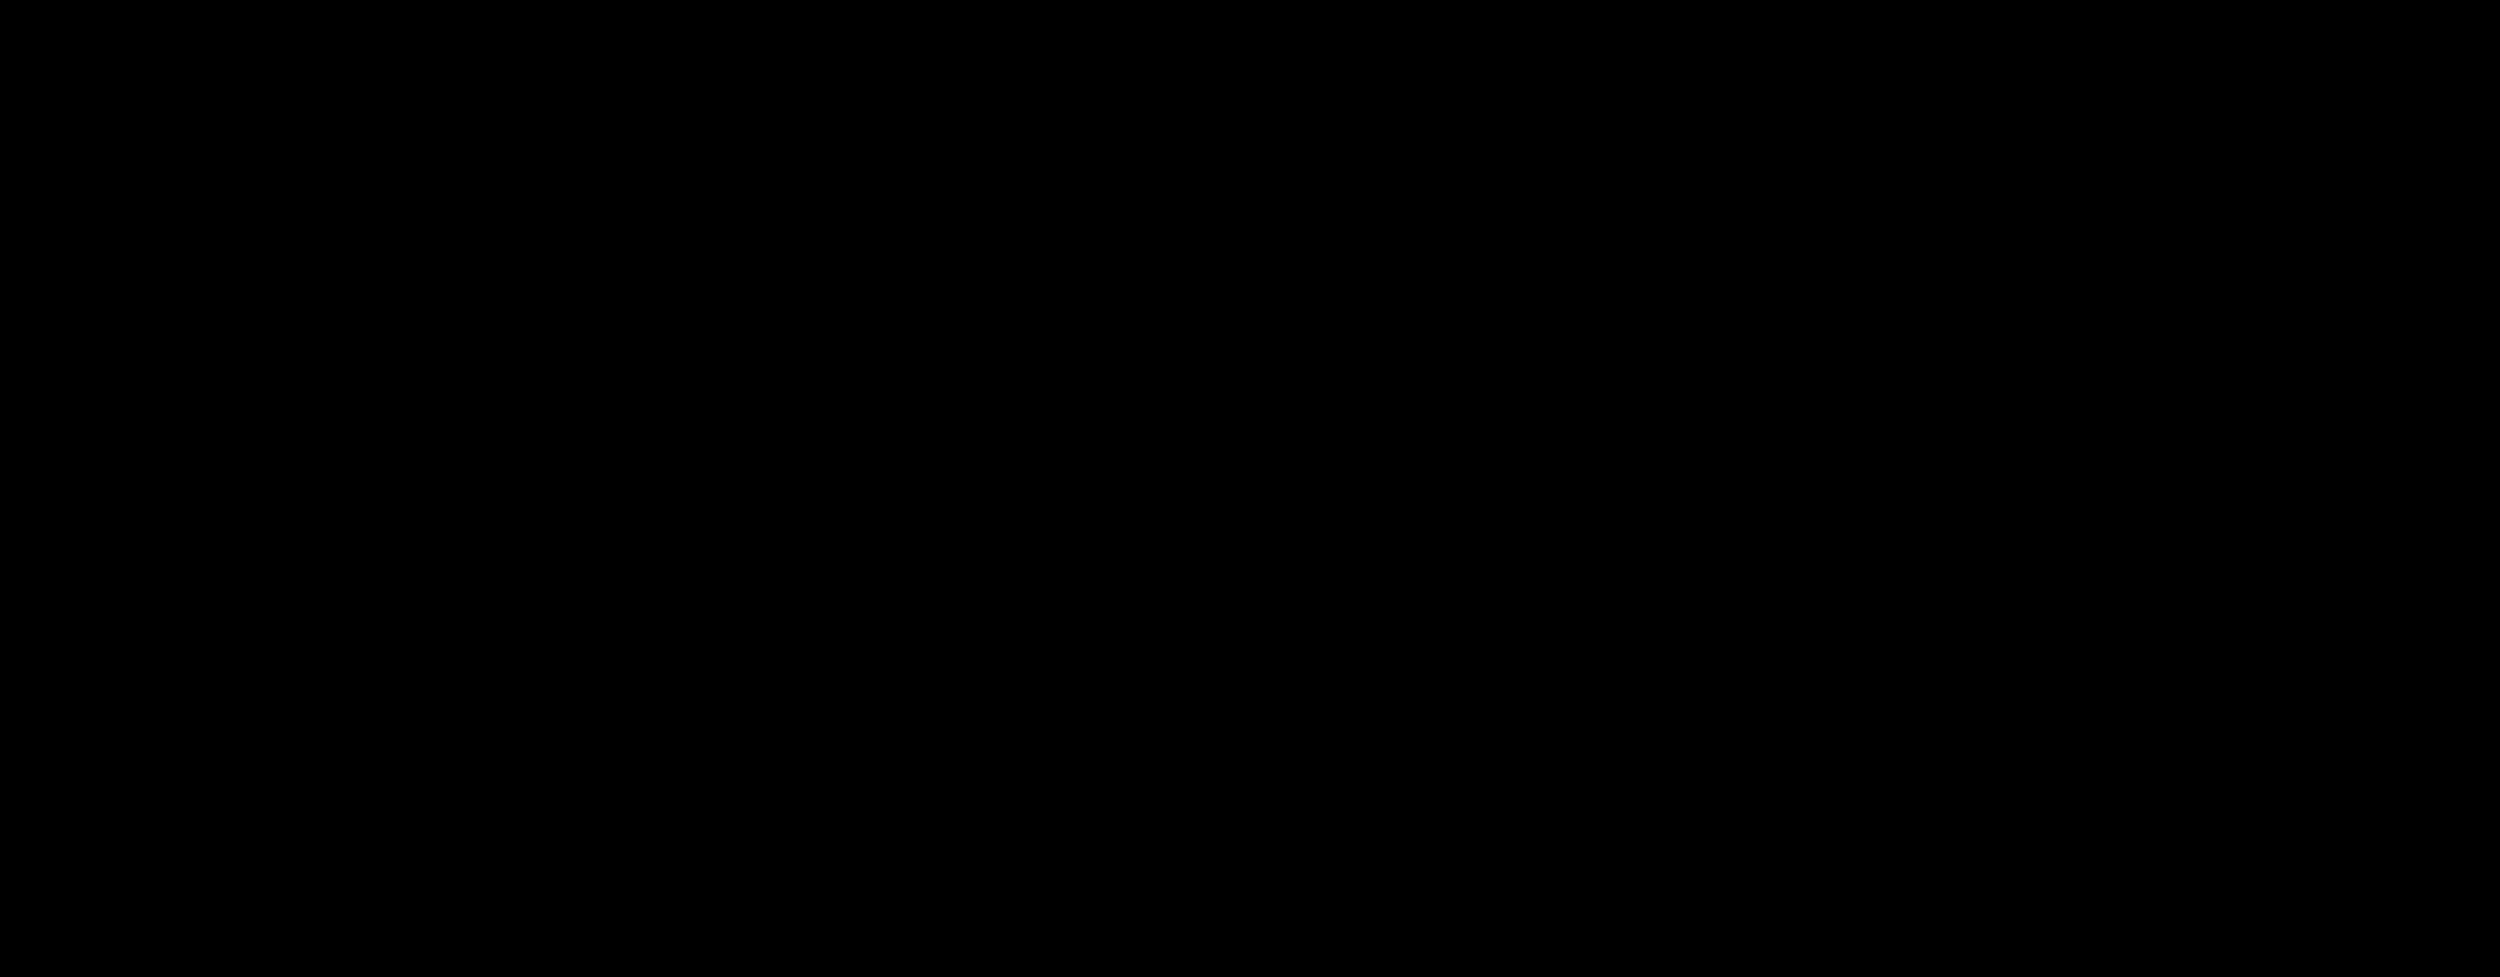 2018 11_Partner Logos.png